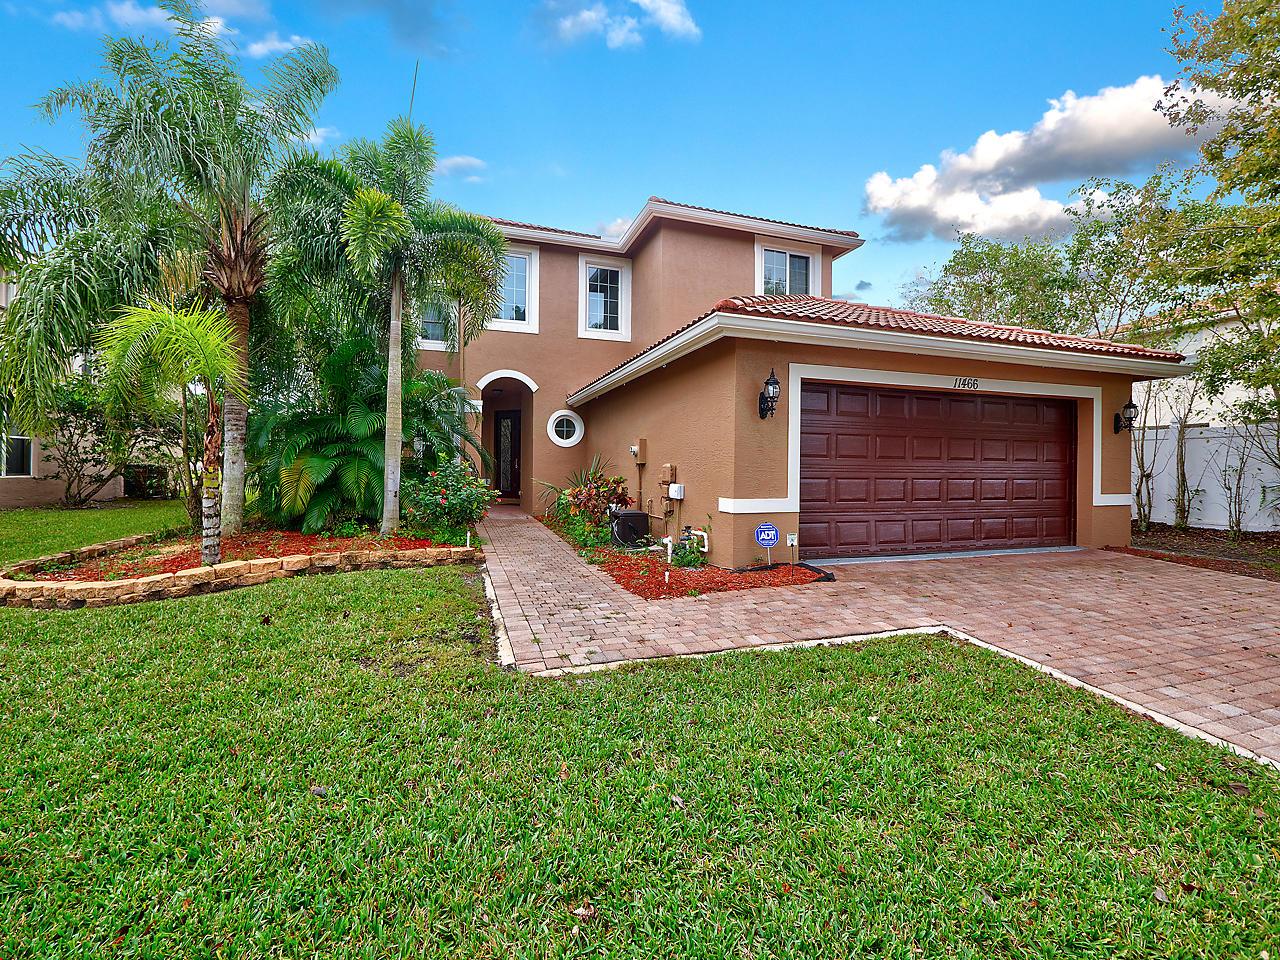 11466 Garden Cress Trail Royal Palm Beach, FL 33411